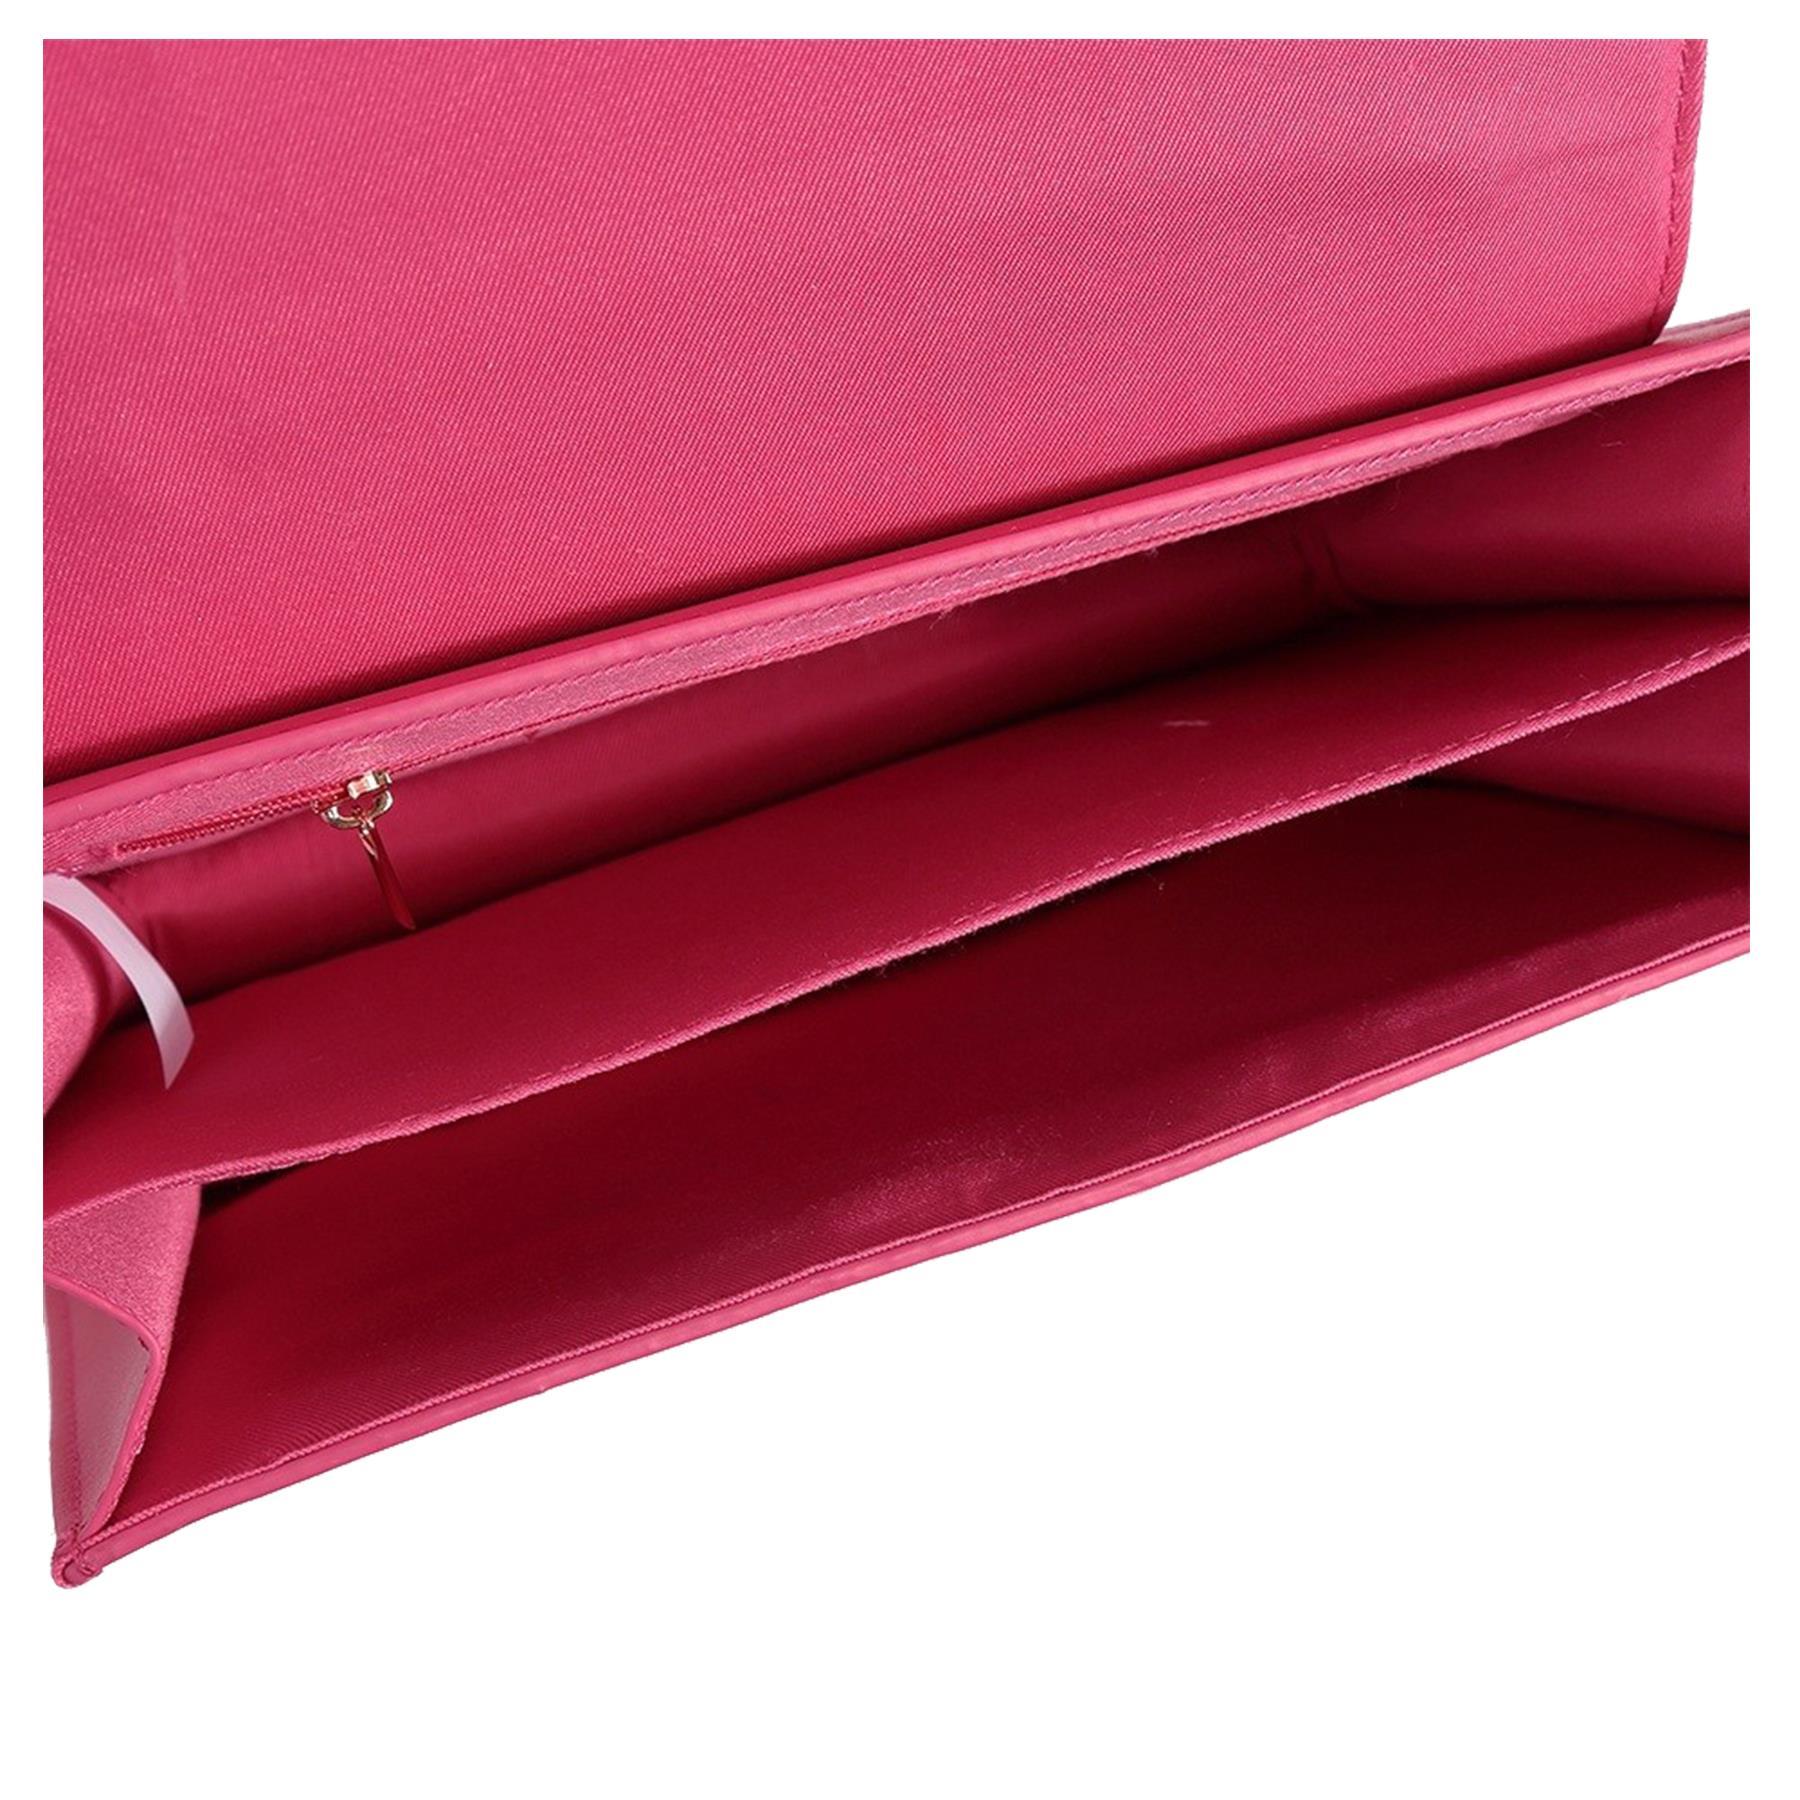 New-Women-s-Faux-Leather-Elegant-Stylish-Fashion-Shoulder-Clutch-Bag thumbnail 16